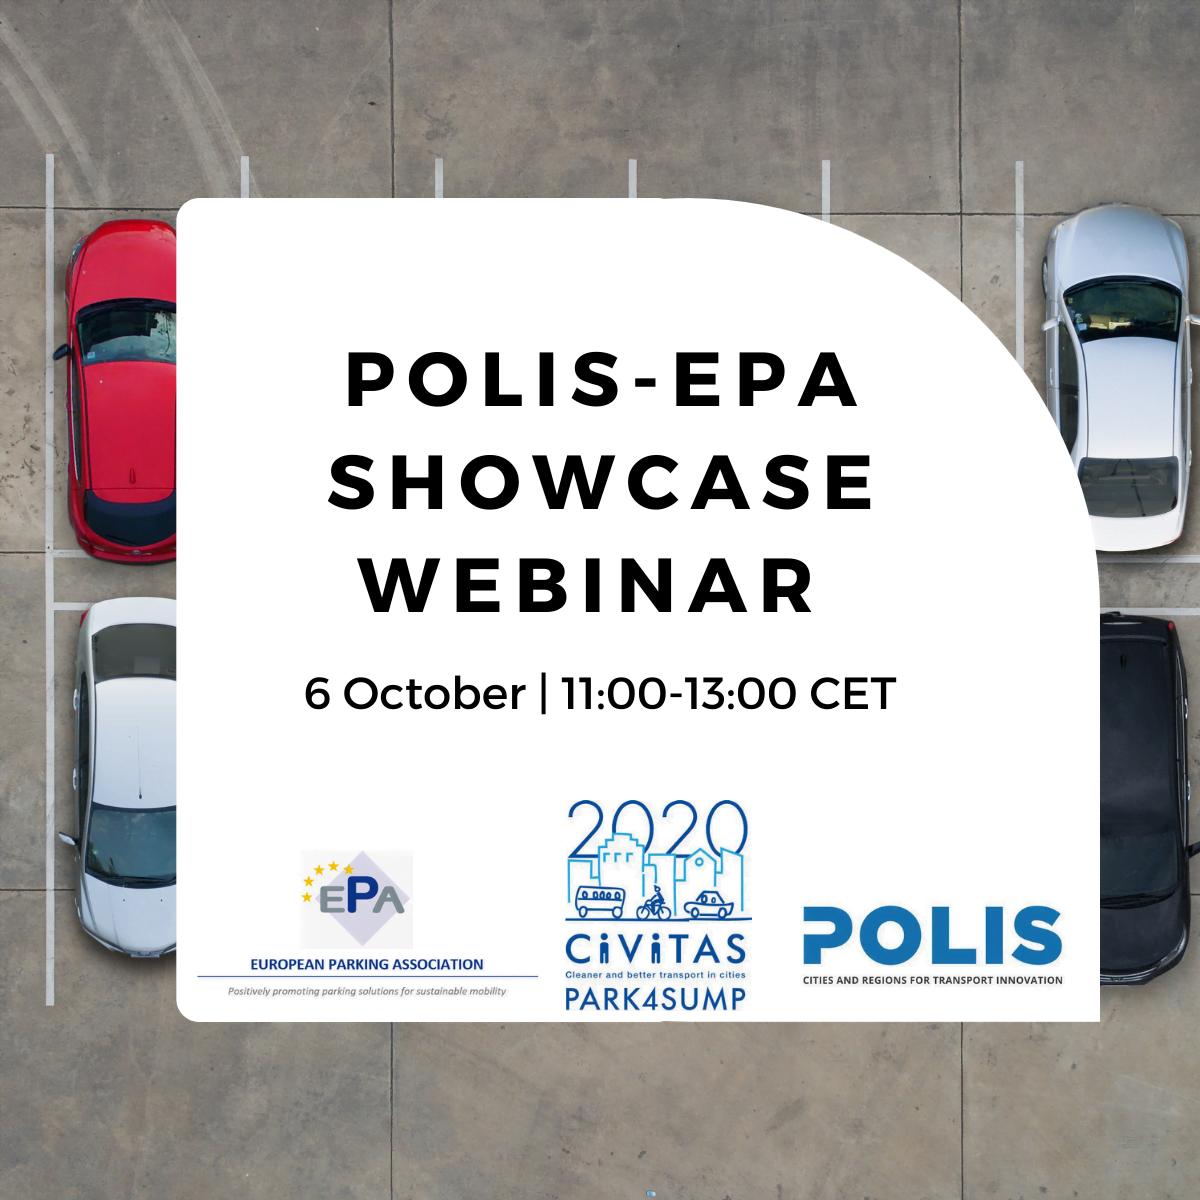 POLIS and EPA launch a new webinar series